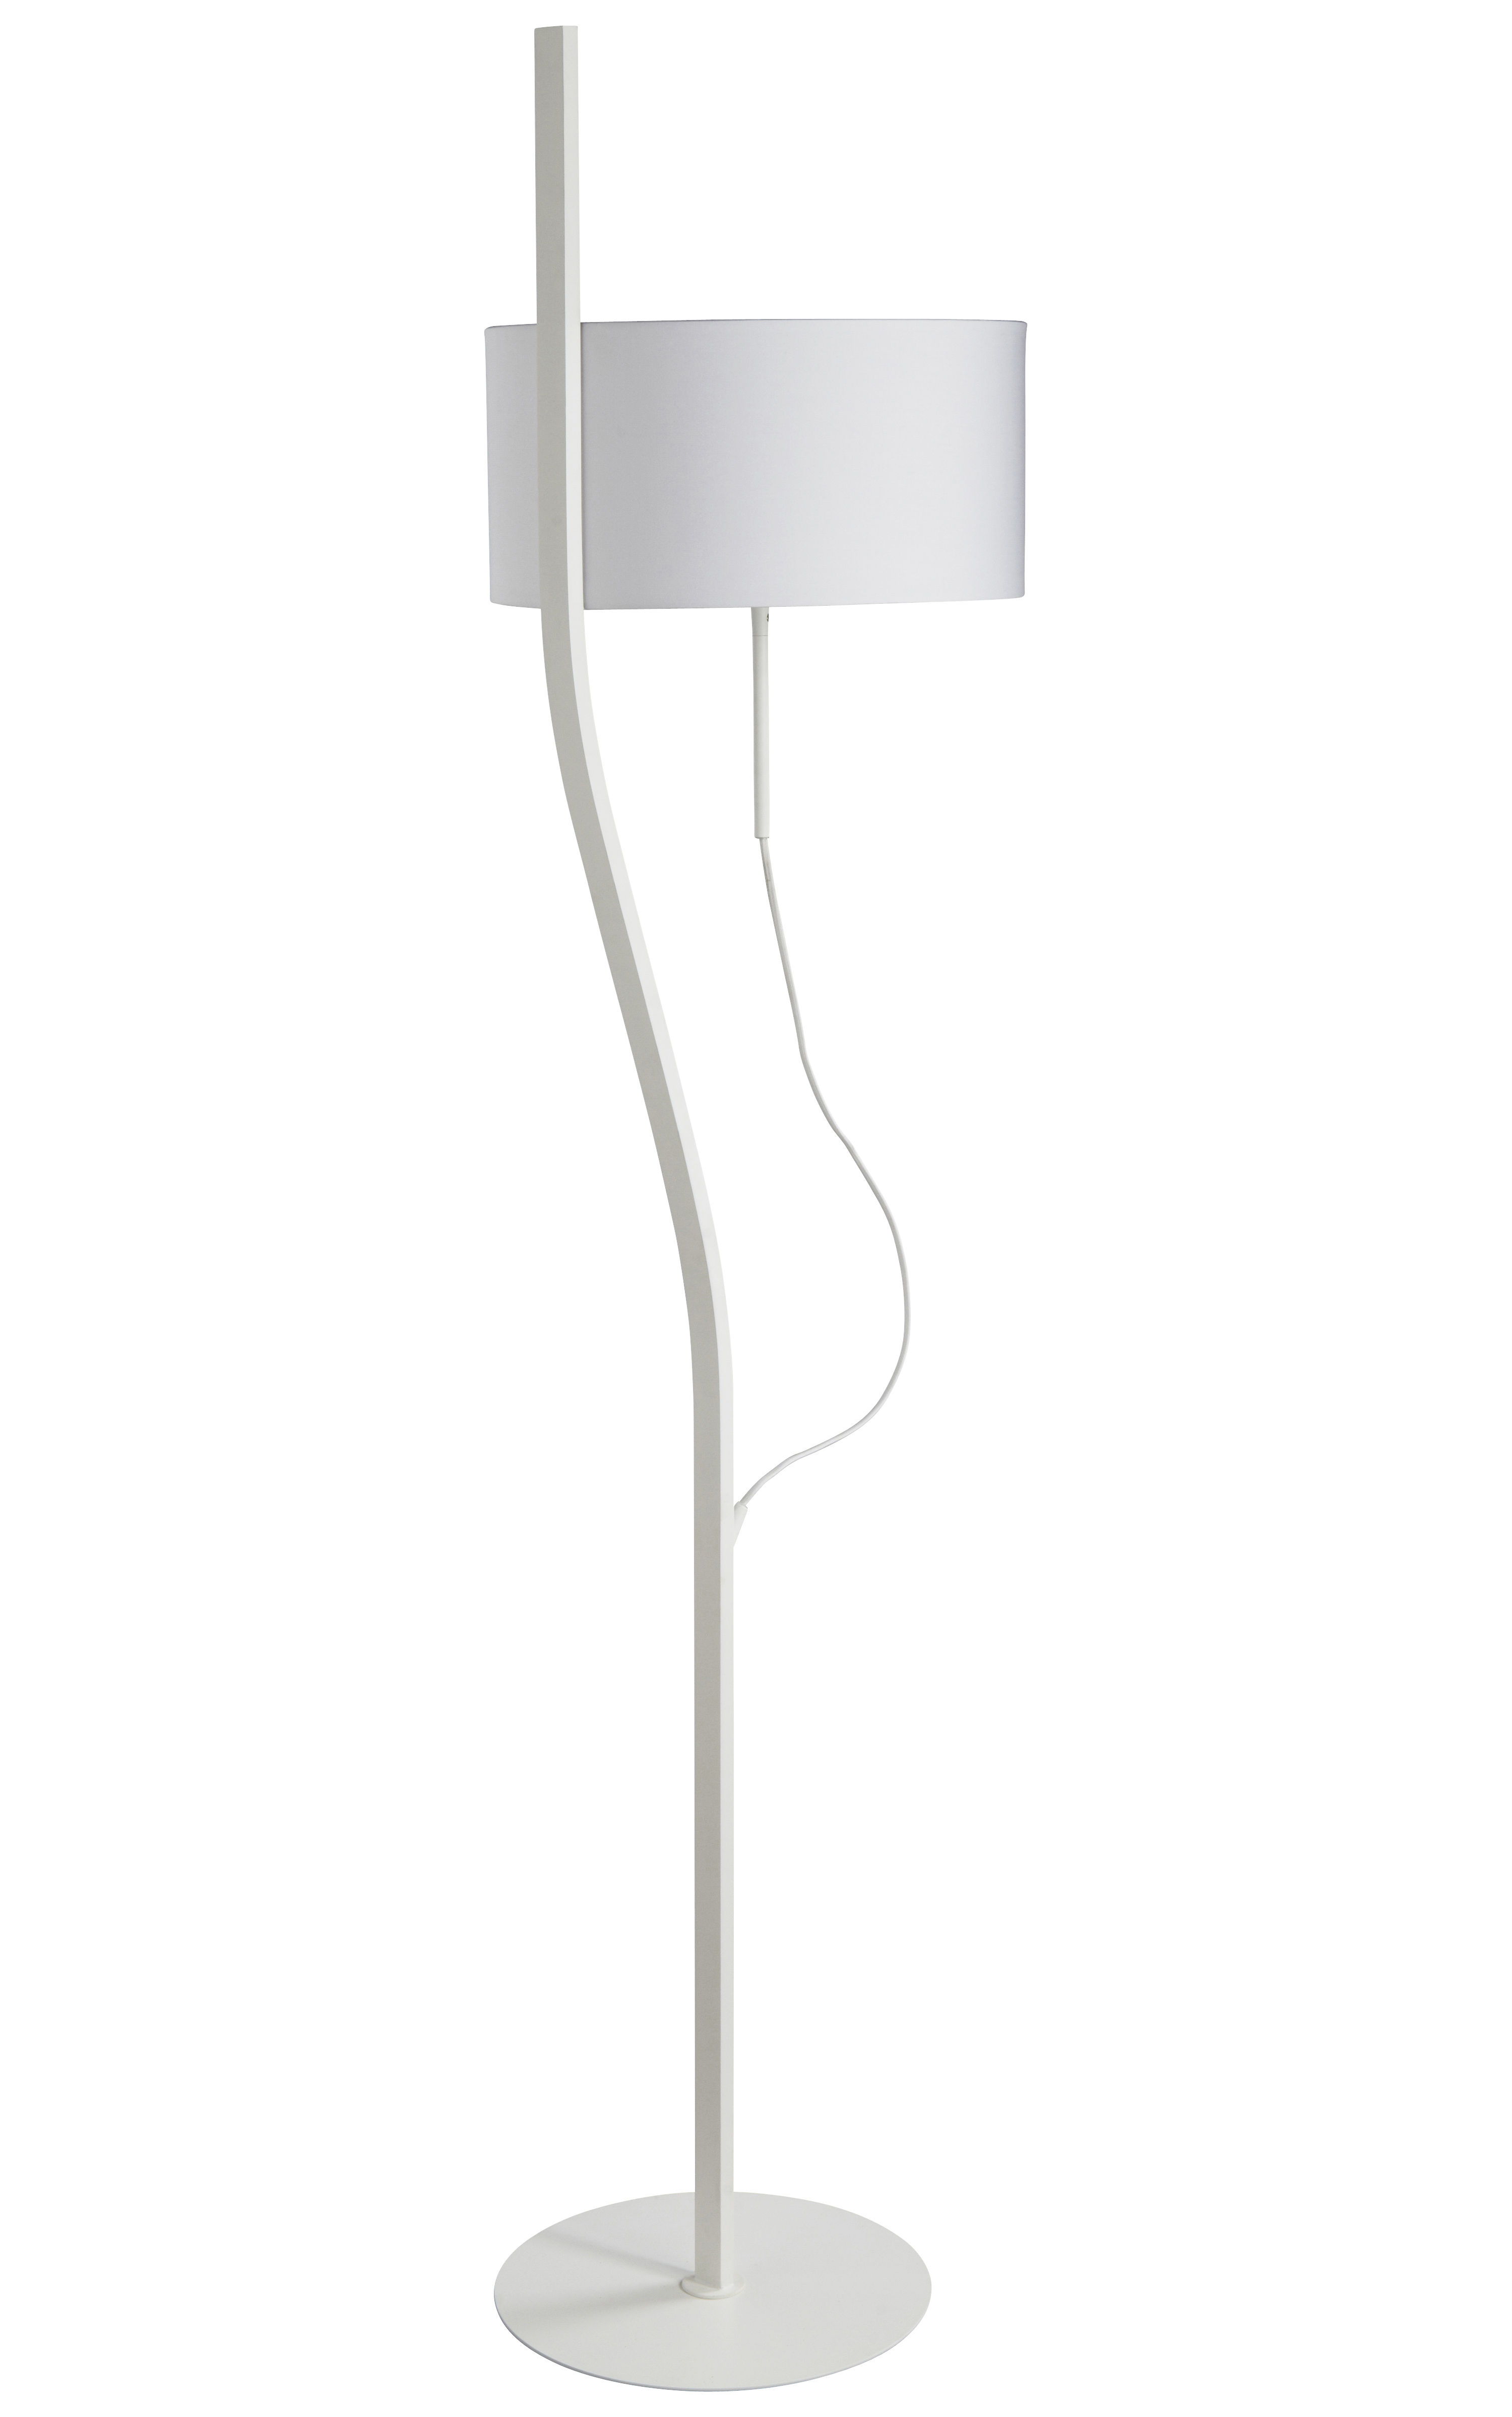 Luminaire - Lampadaires - Lampadaire Baladeuse H 170 cm - Forestier - Blanc - Coton, Métal laqué